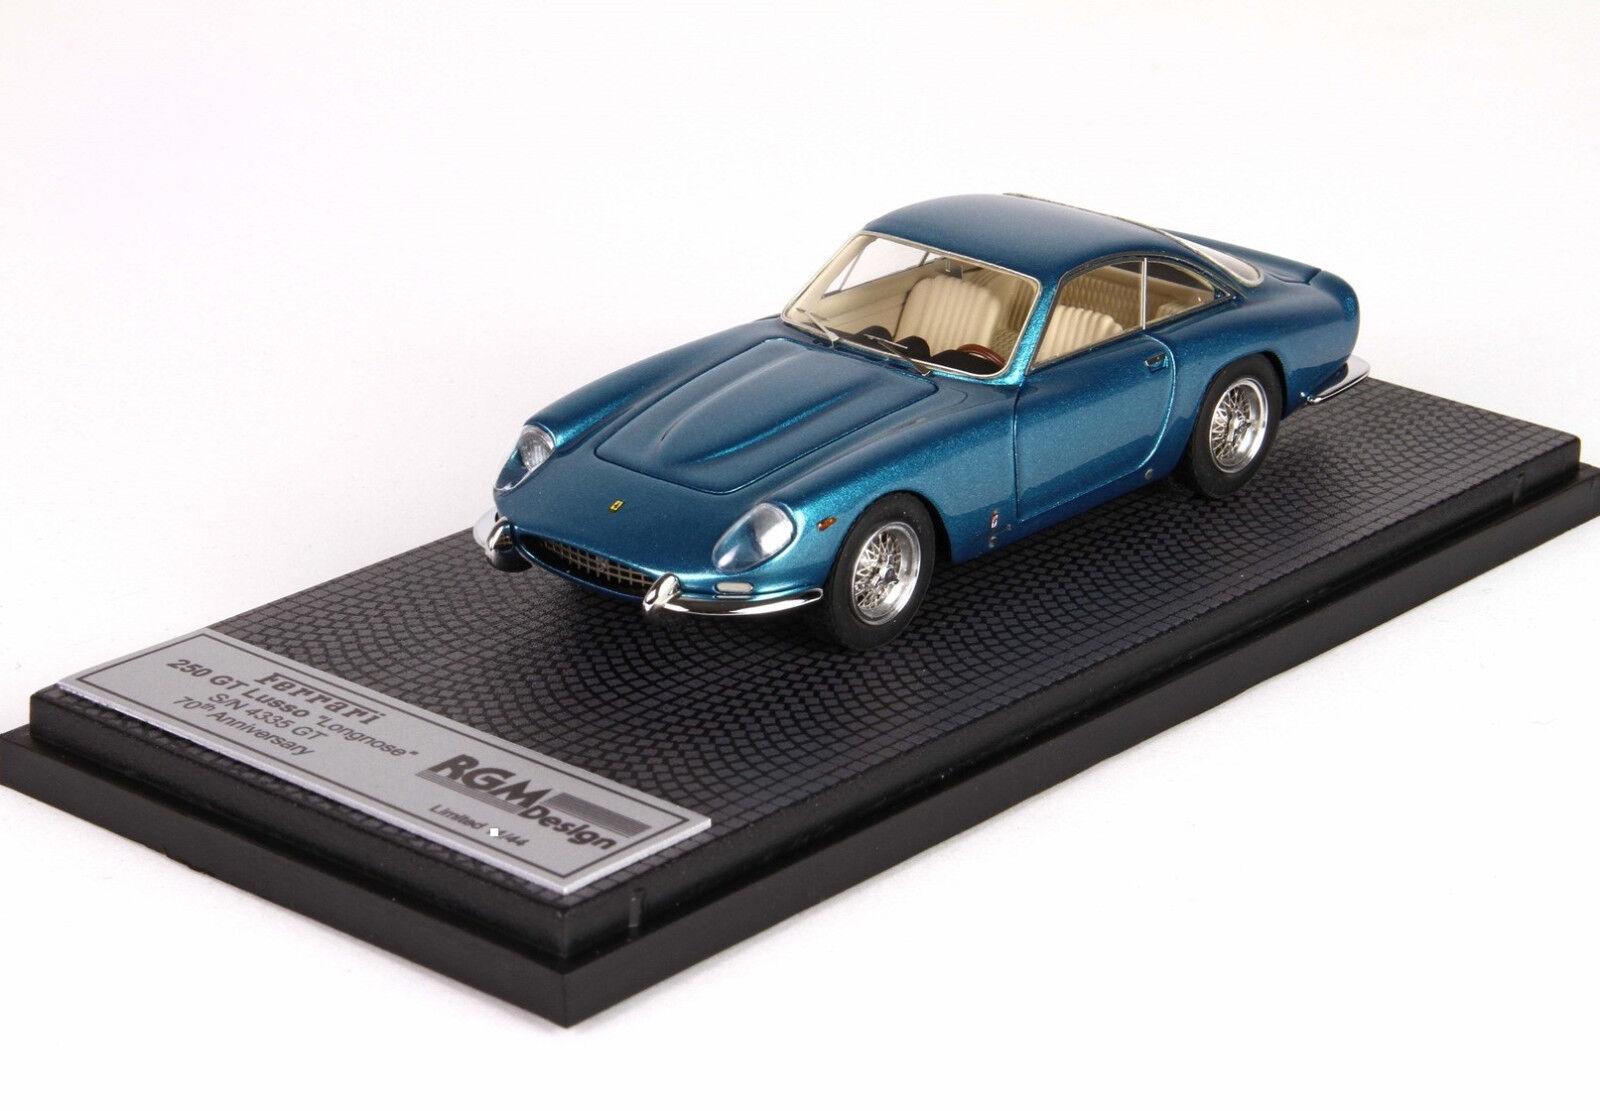 Ferrari 250 GT Lusso SN 4335 Long Nose lim.ed. 44 pcs RGM 15-8 BbrModels